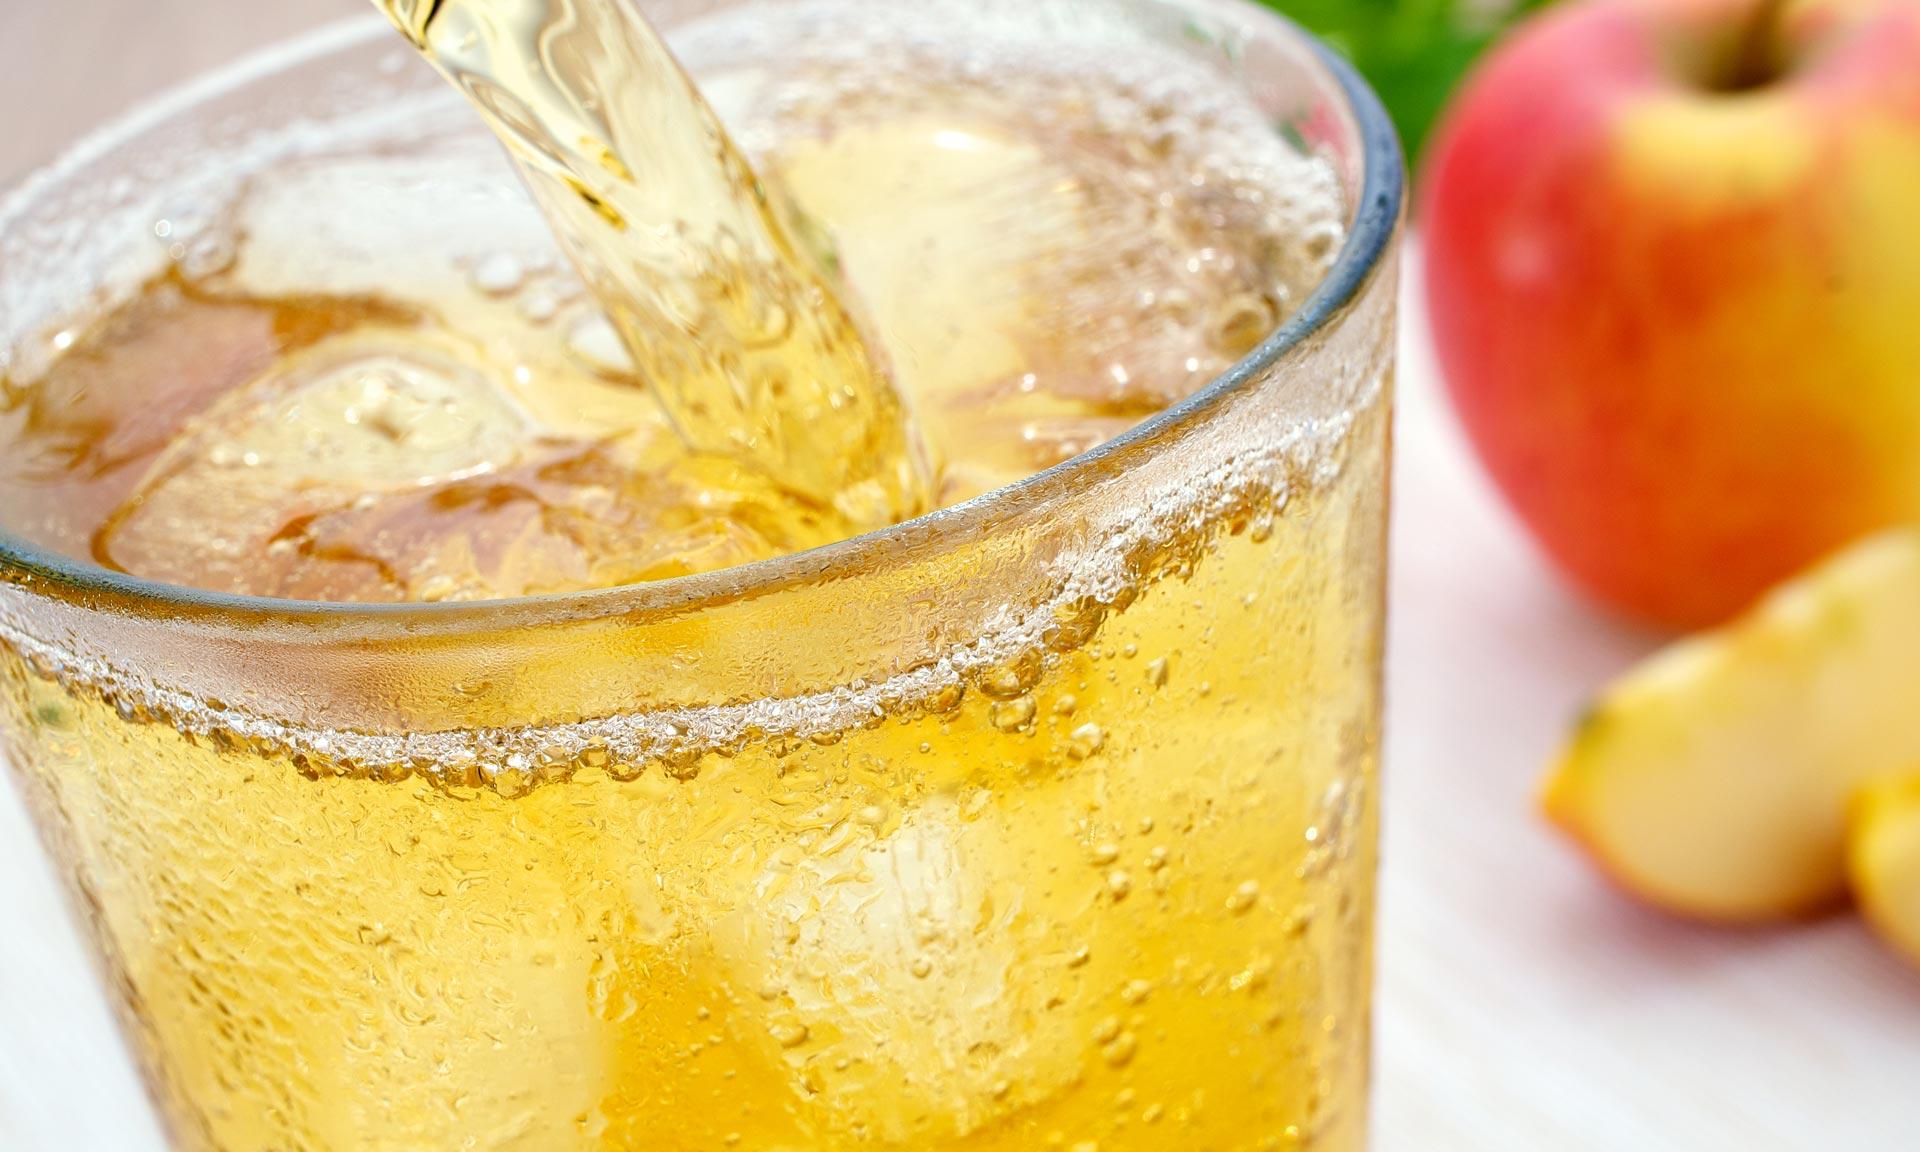 Cider-Apfelsaft-Brauunion-Graz